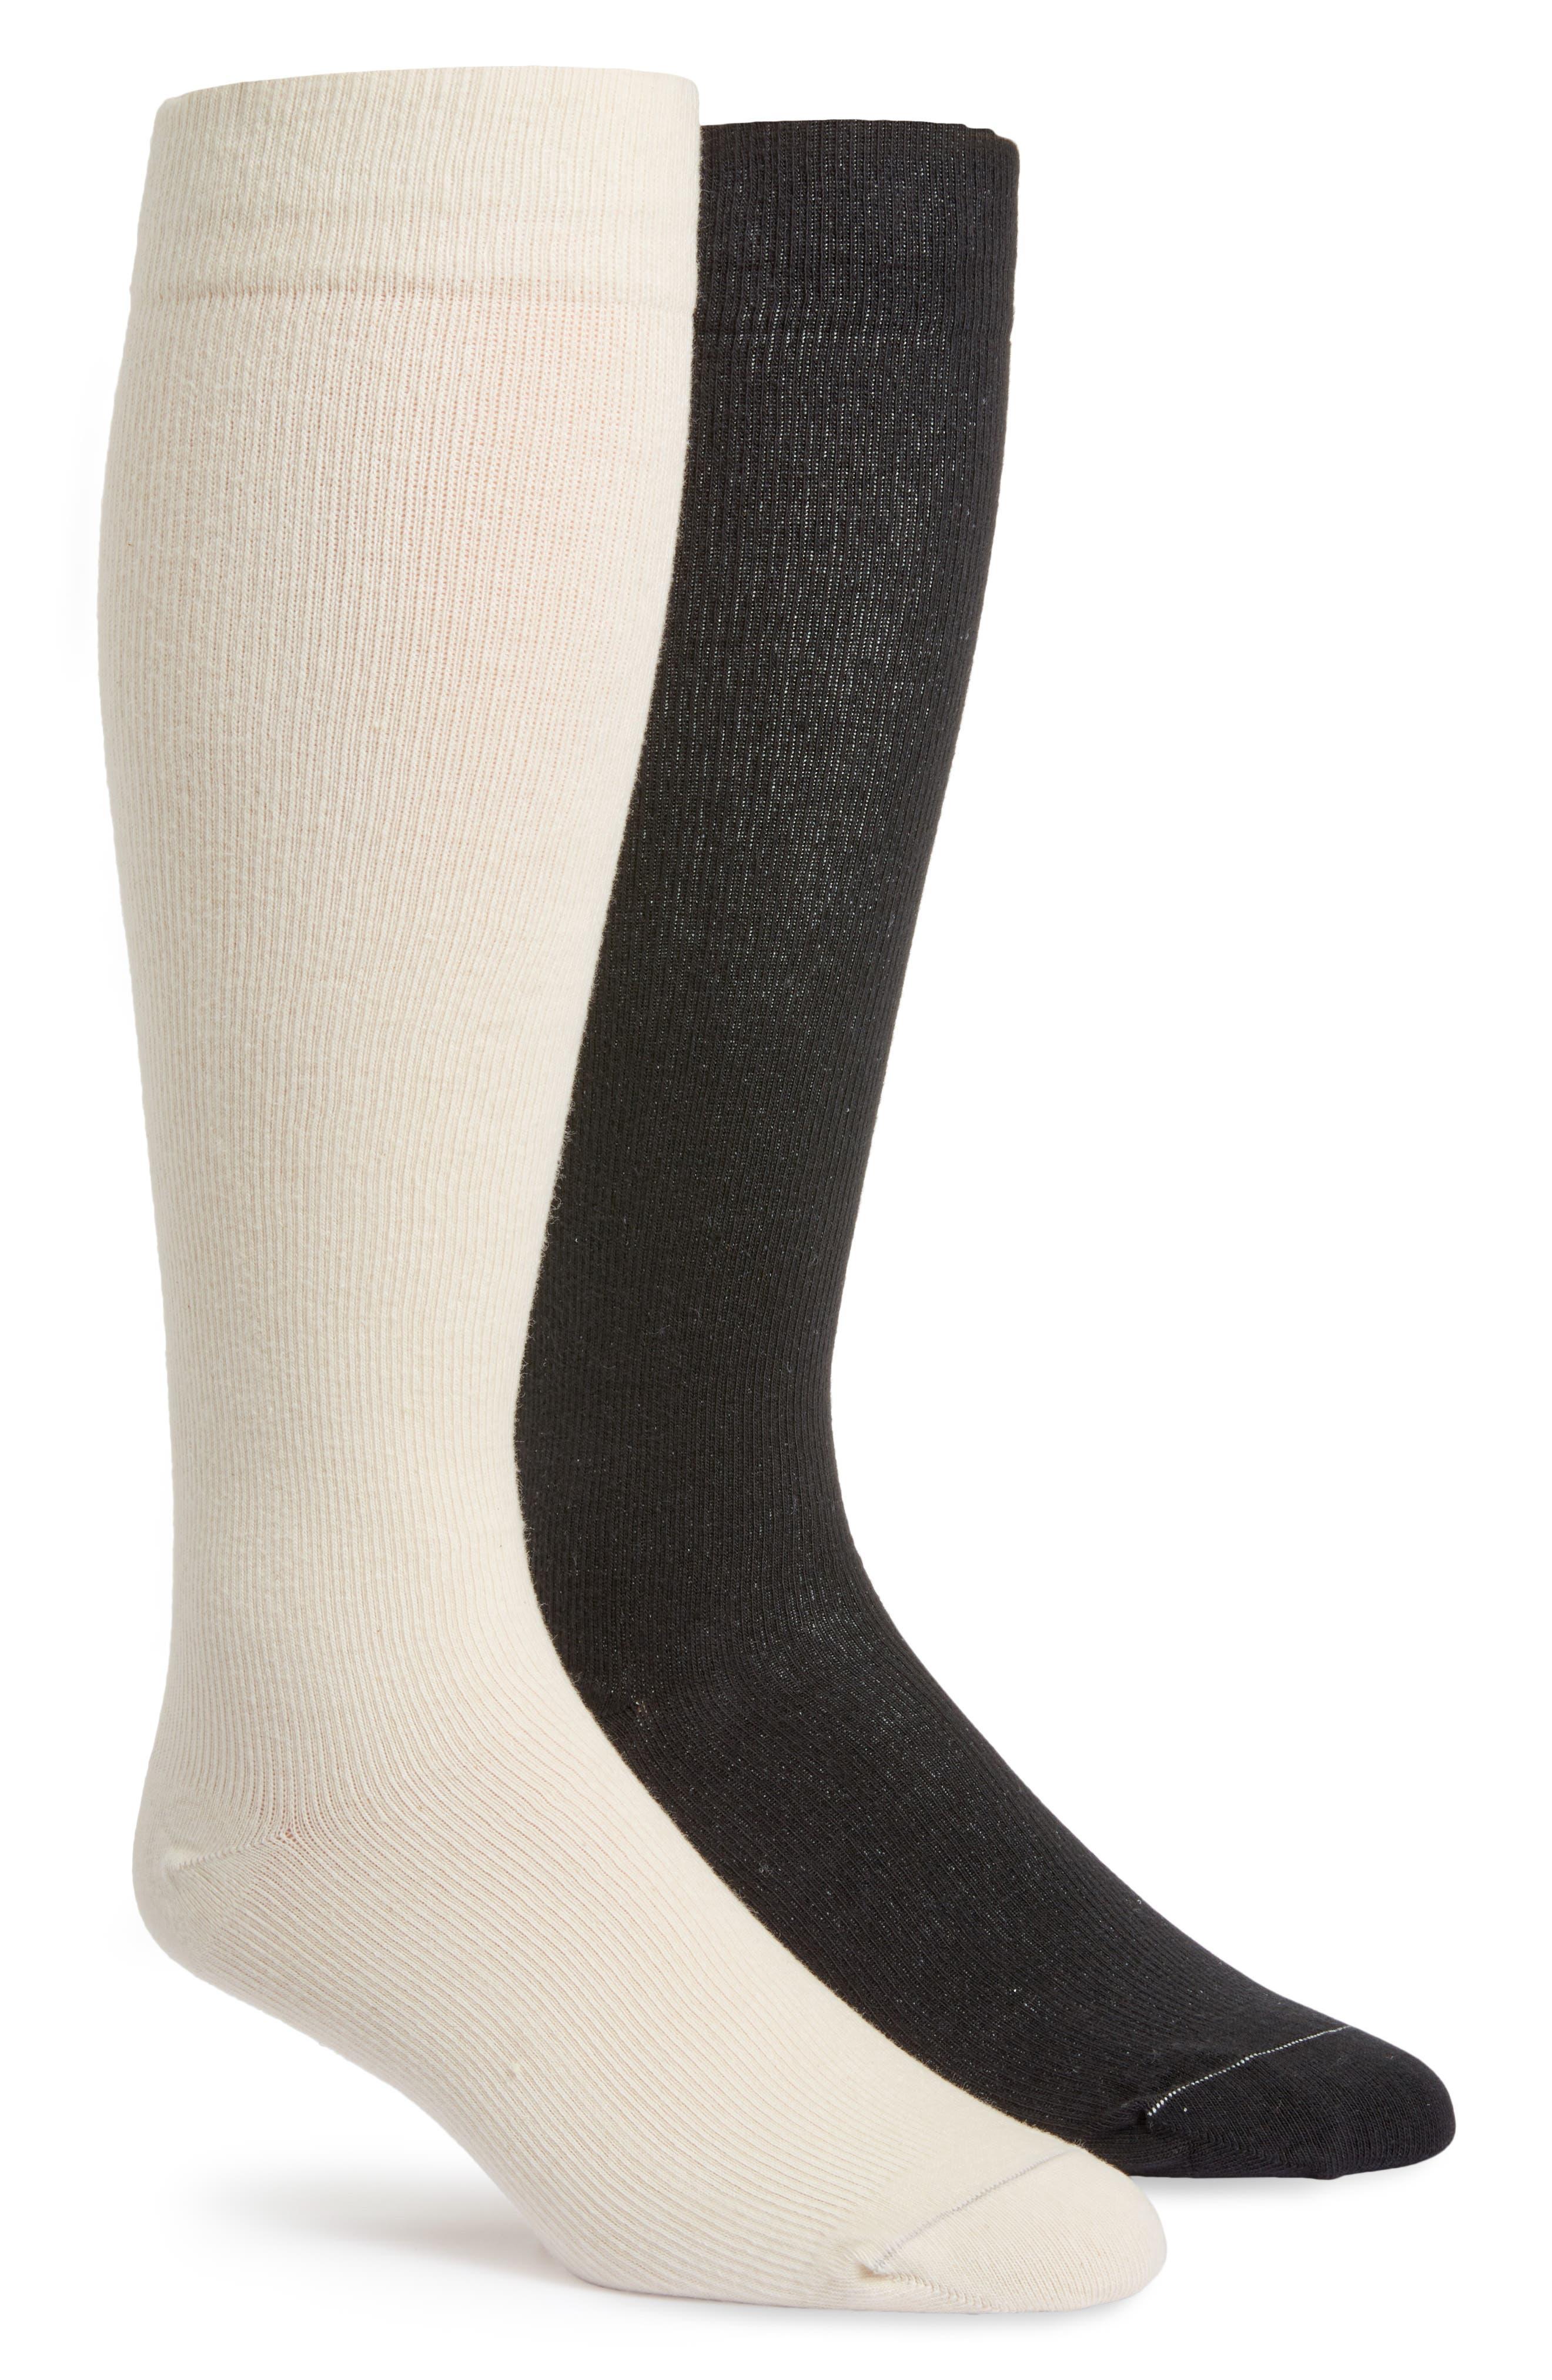 Assorted 2-Pack Organic Cotton Blend Compression Socks